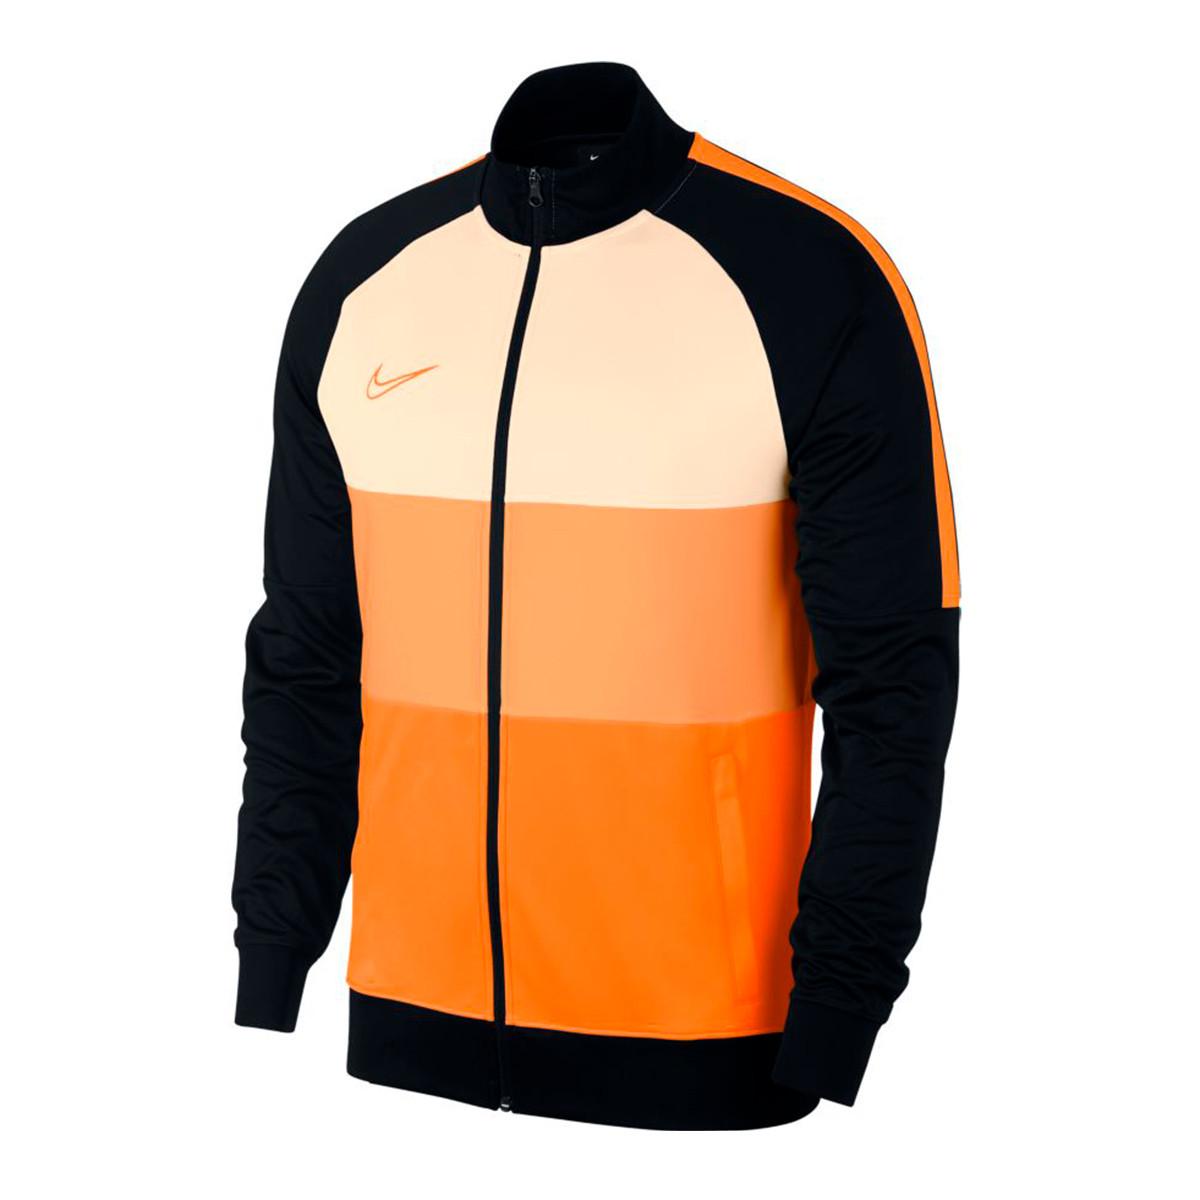 86ee84093 Jacket Nike Dri-FIT Academy Black-Guava ice-Total orange - Football ...